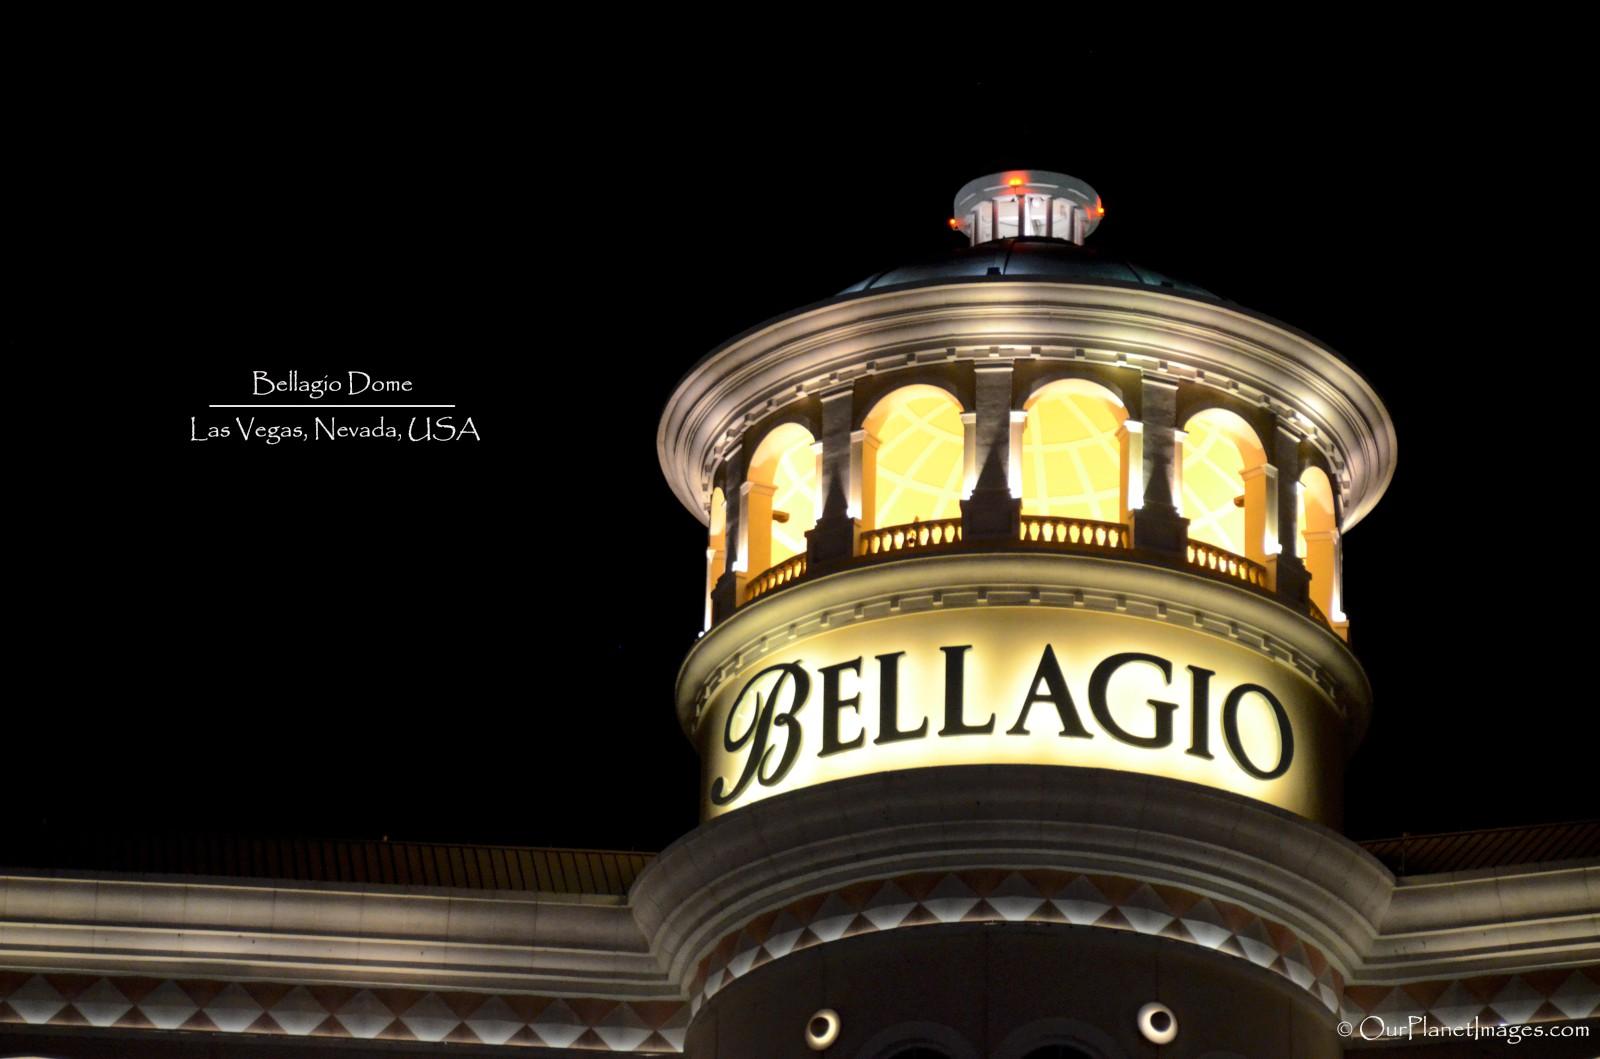 Bellagio dome at night